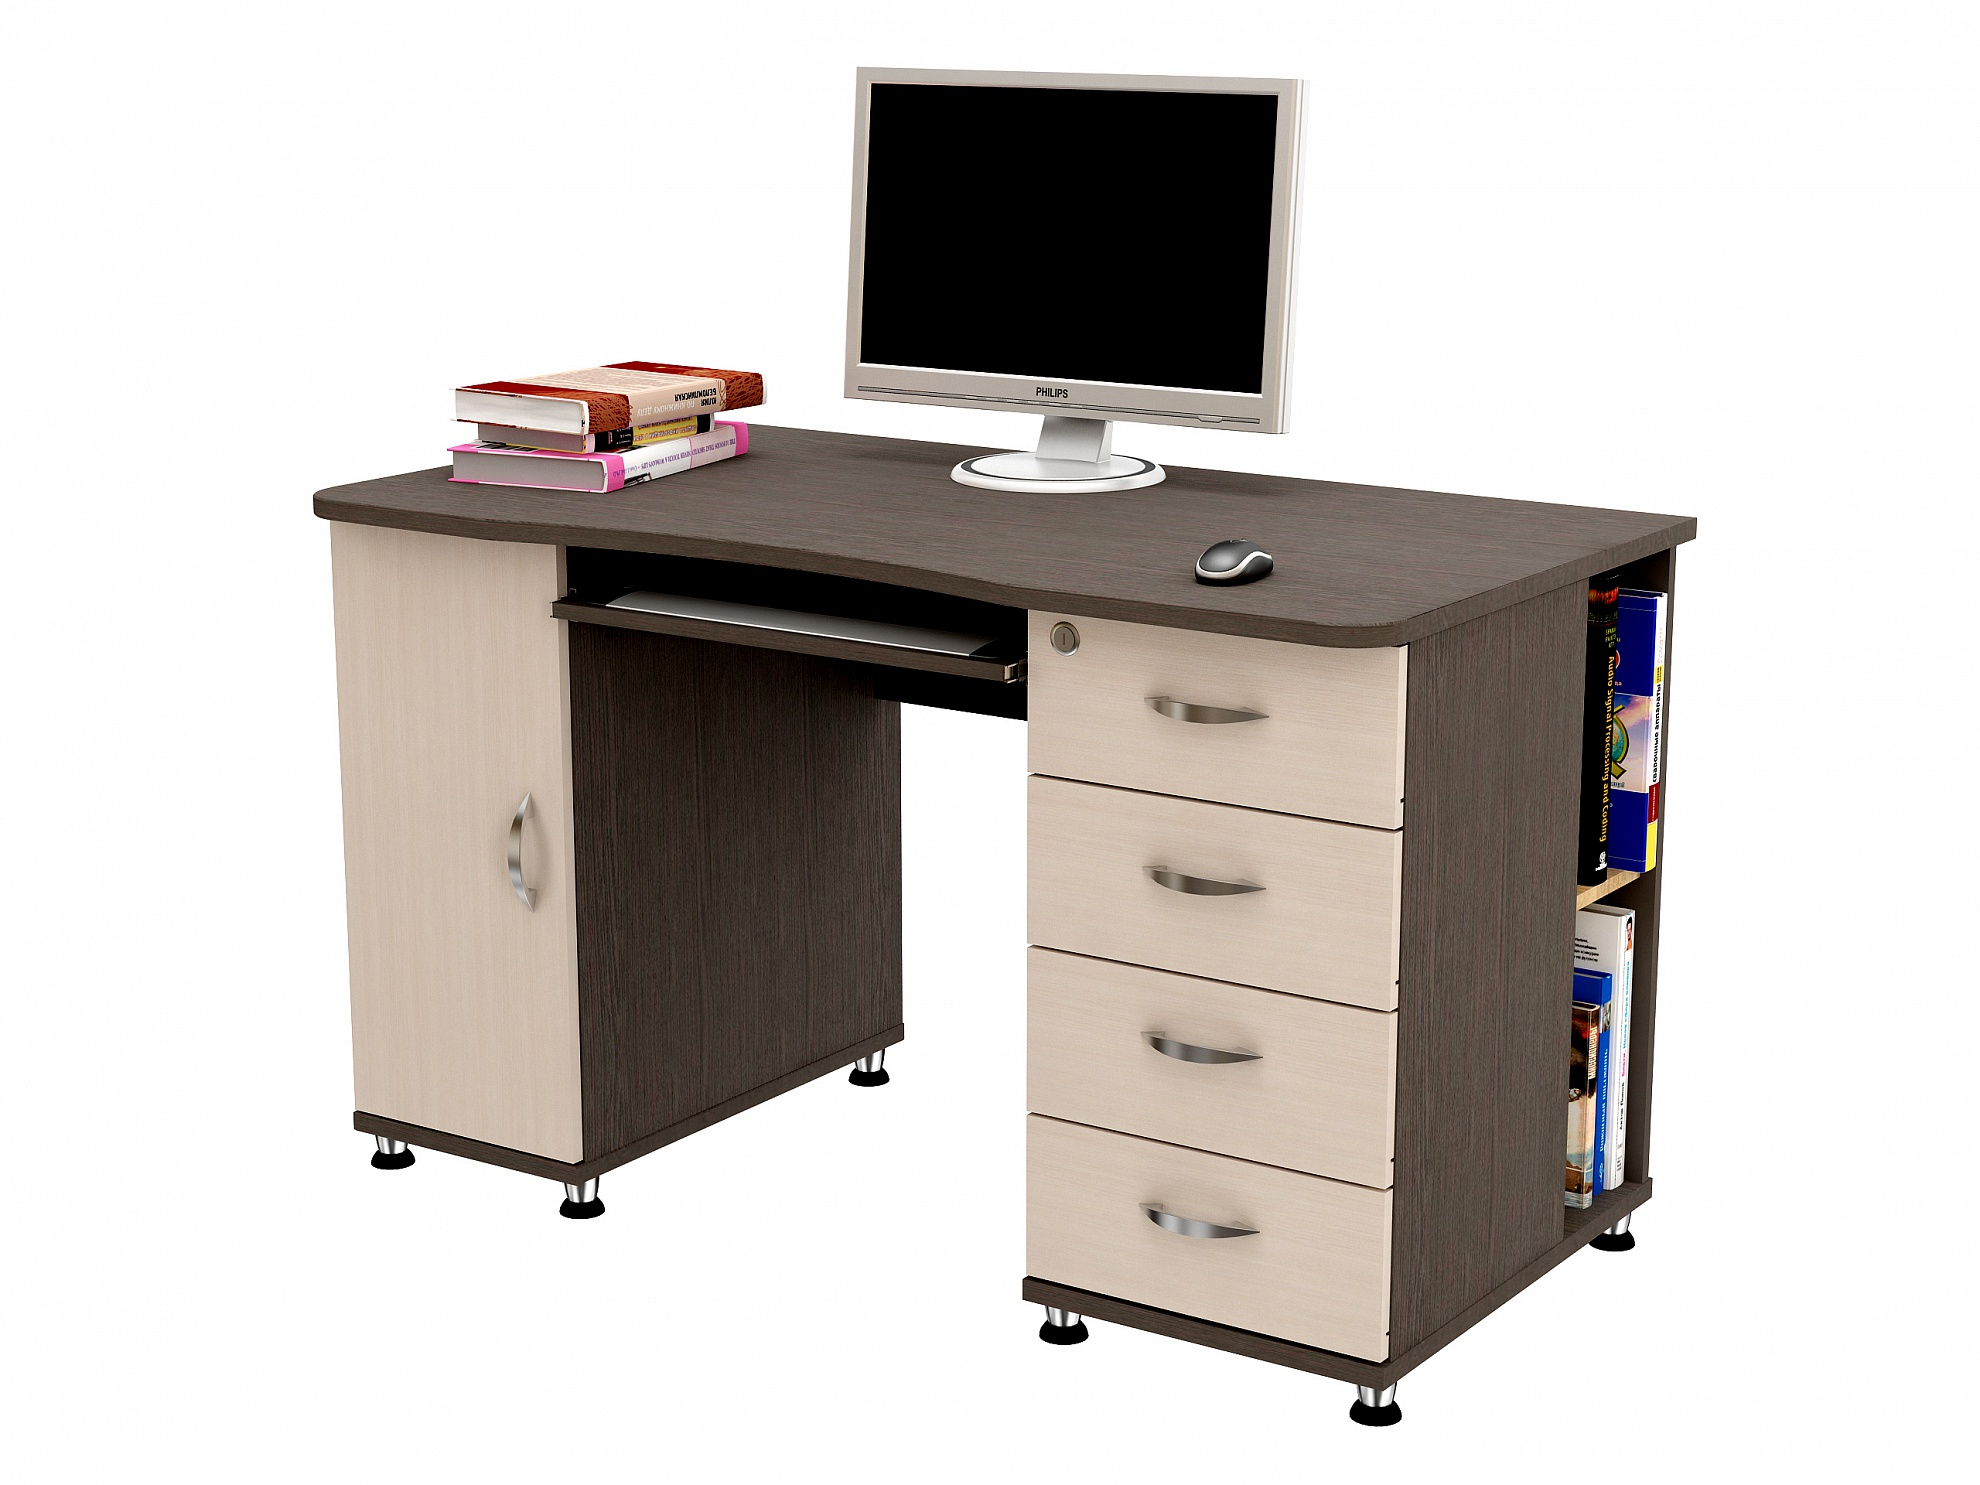 Компьютерный стол КС 20-39 компьютерный стол кс 20 16м3